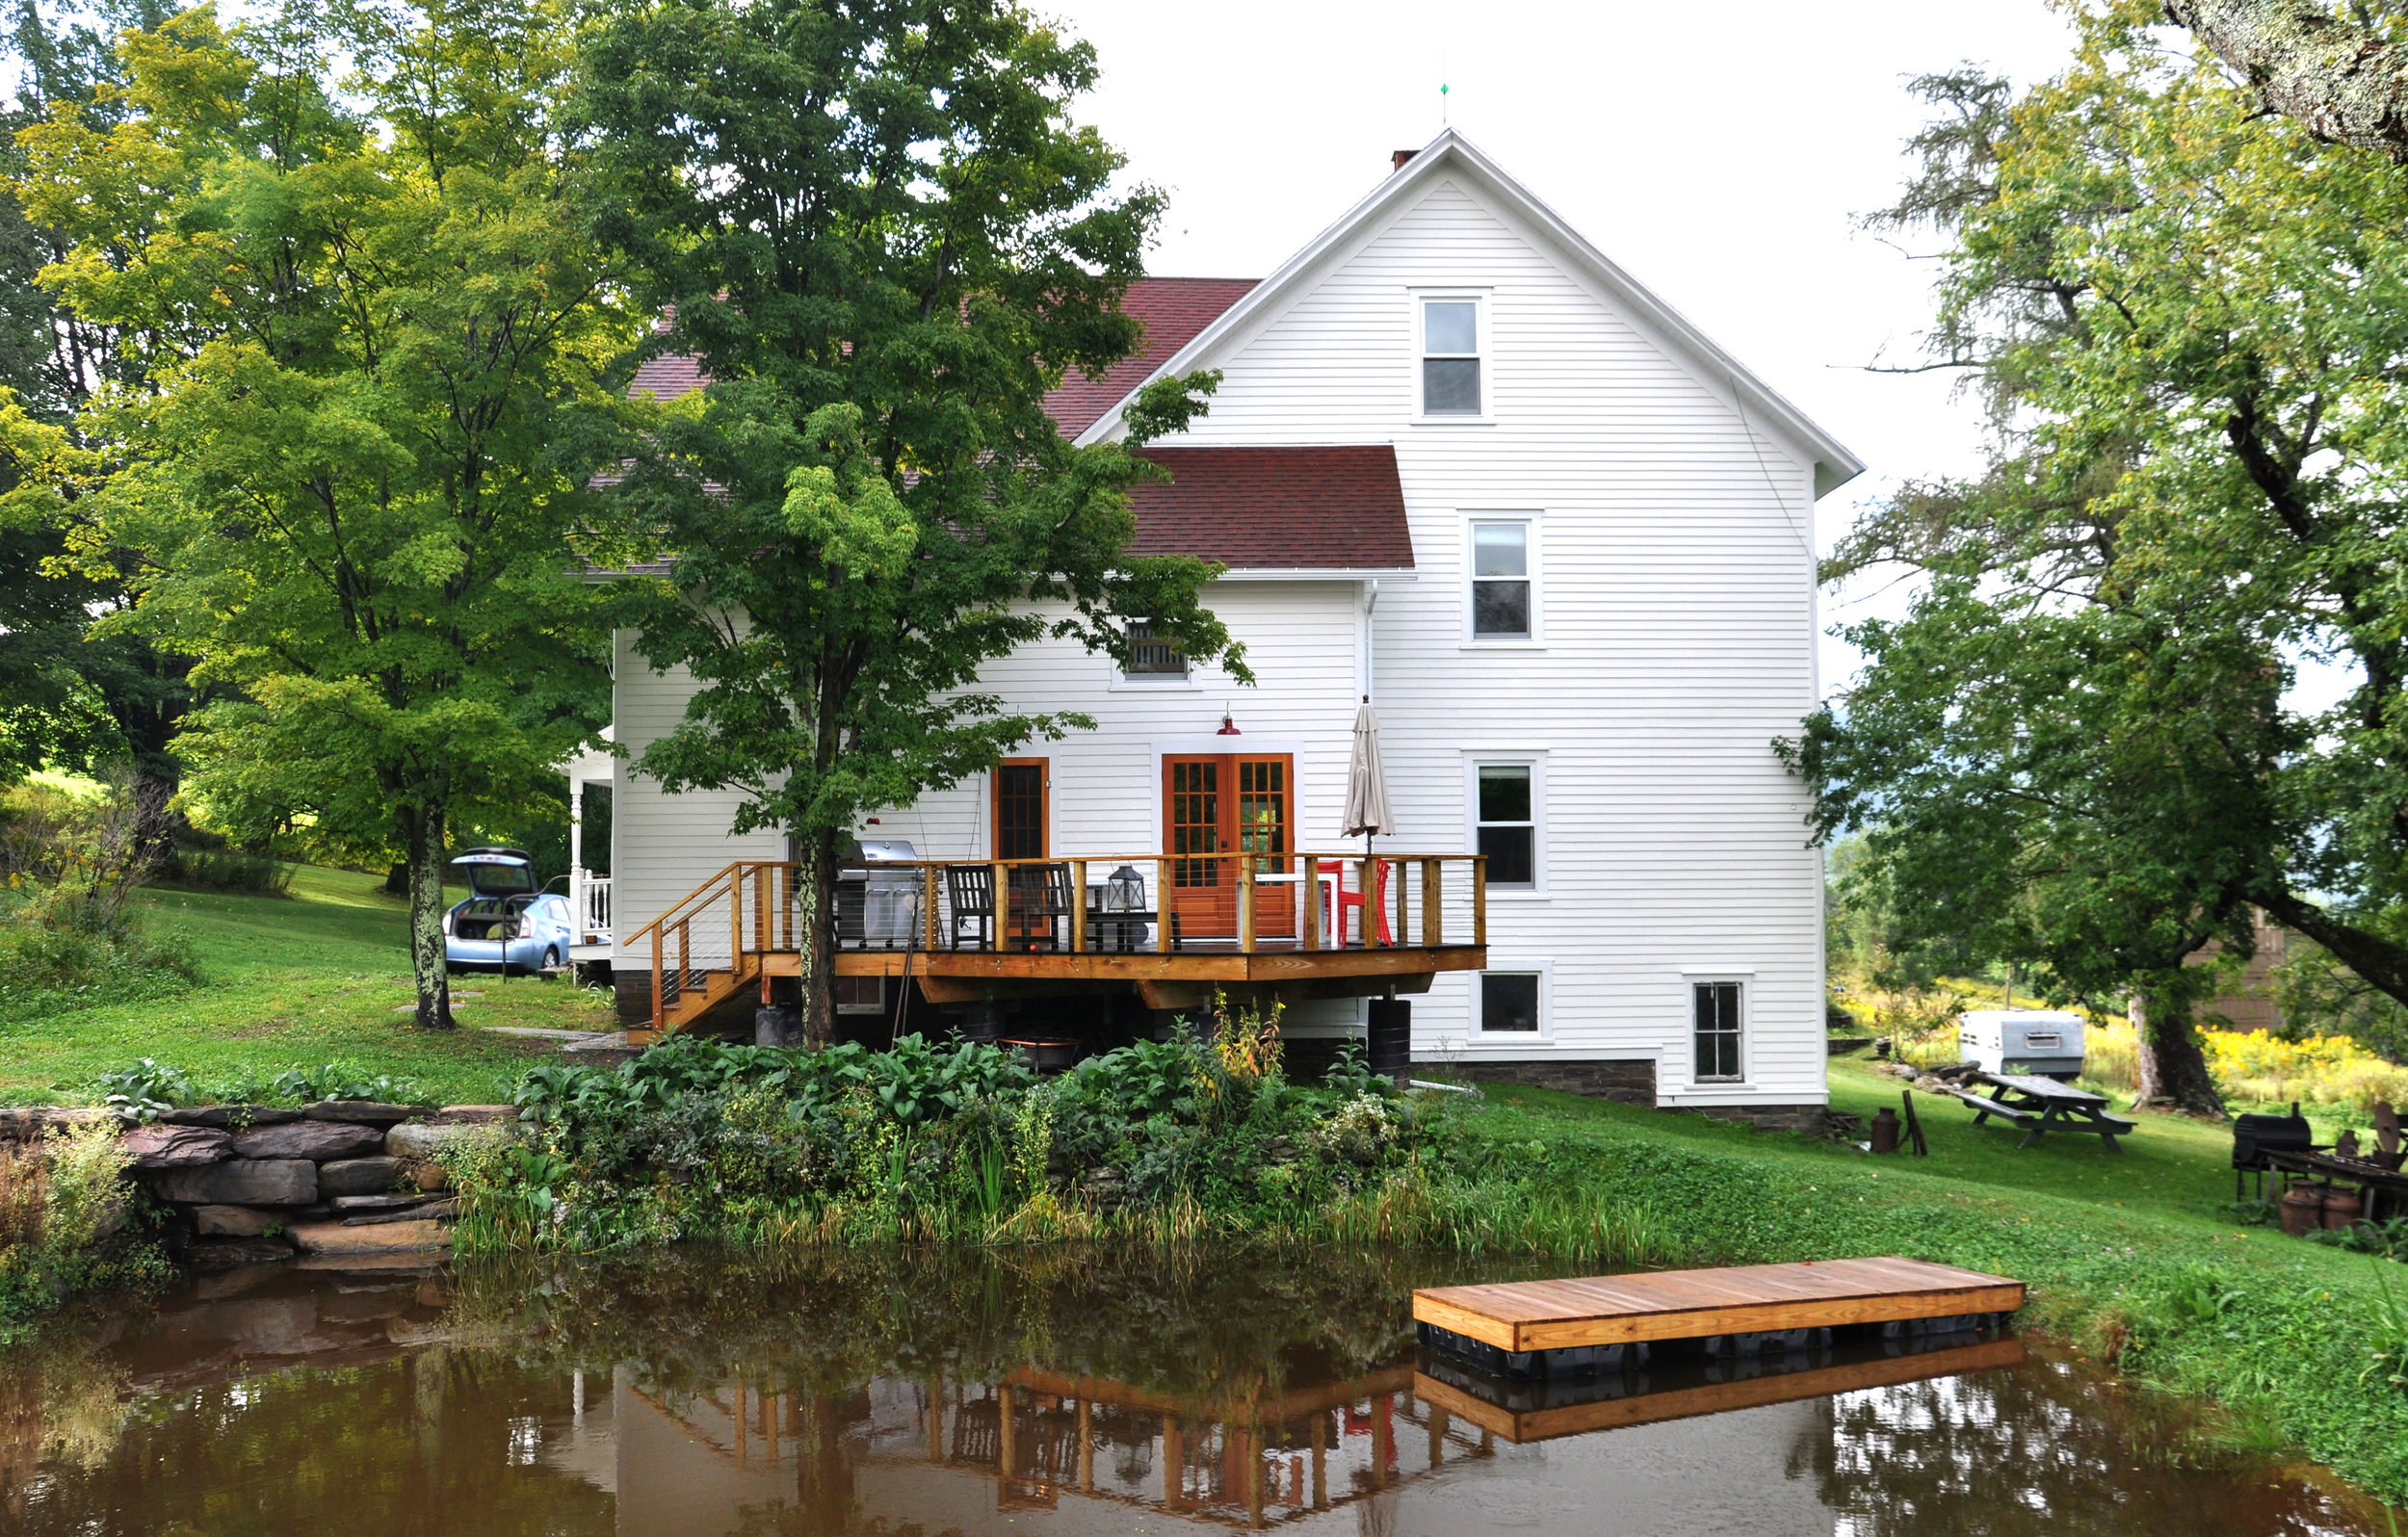 modernized rural farmhouse, residential renovation, deck, porch, outdoor dining, mountain home, pond